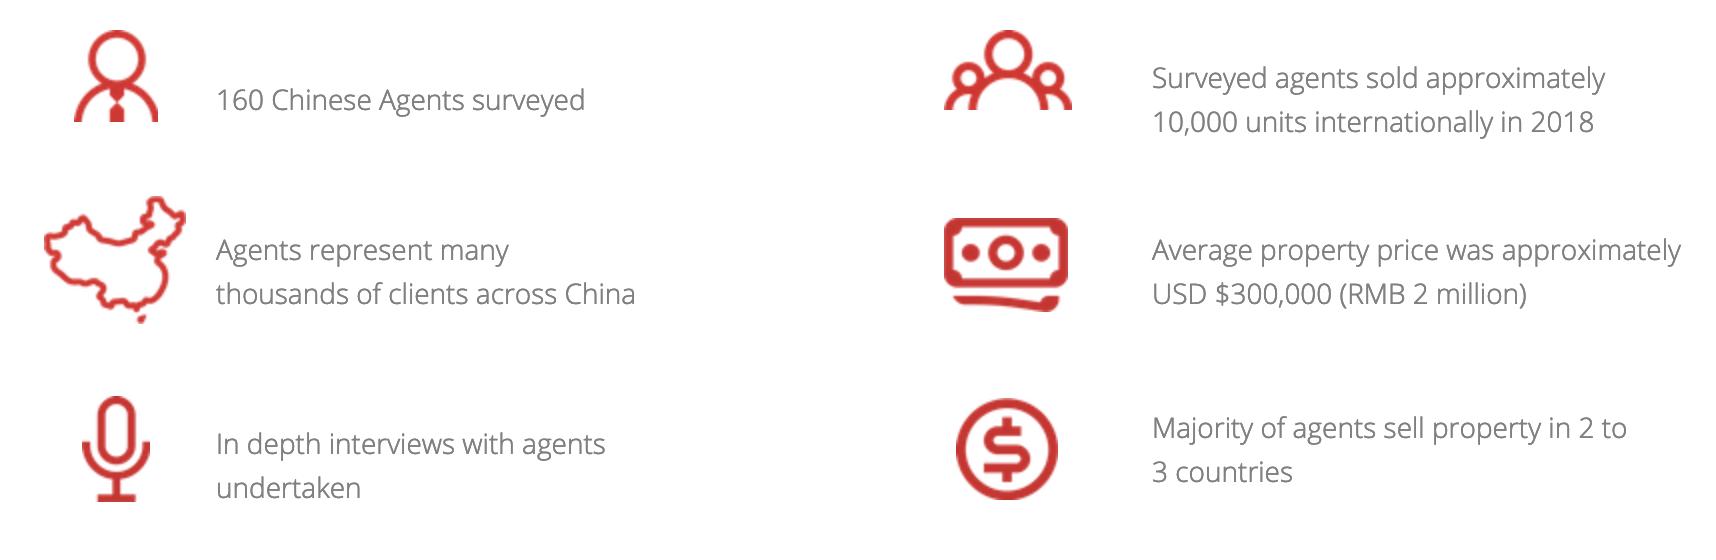 China 2019 International Property Outlook